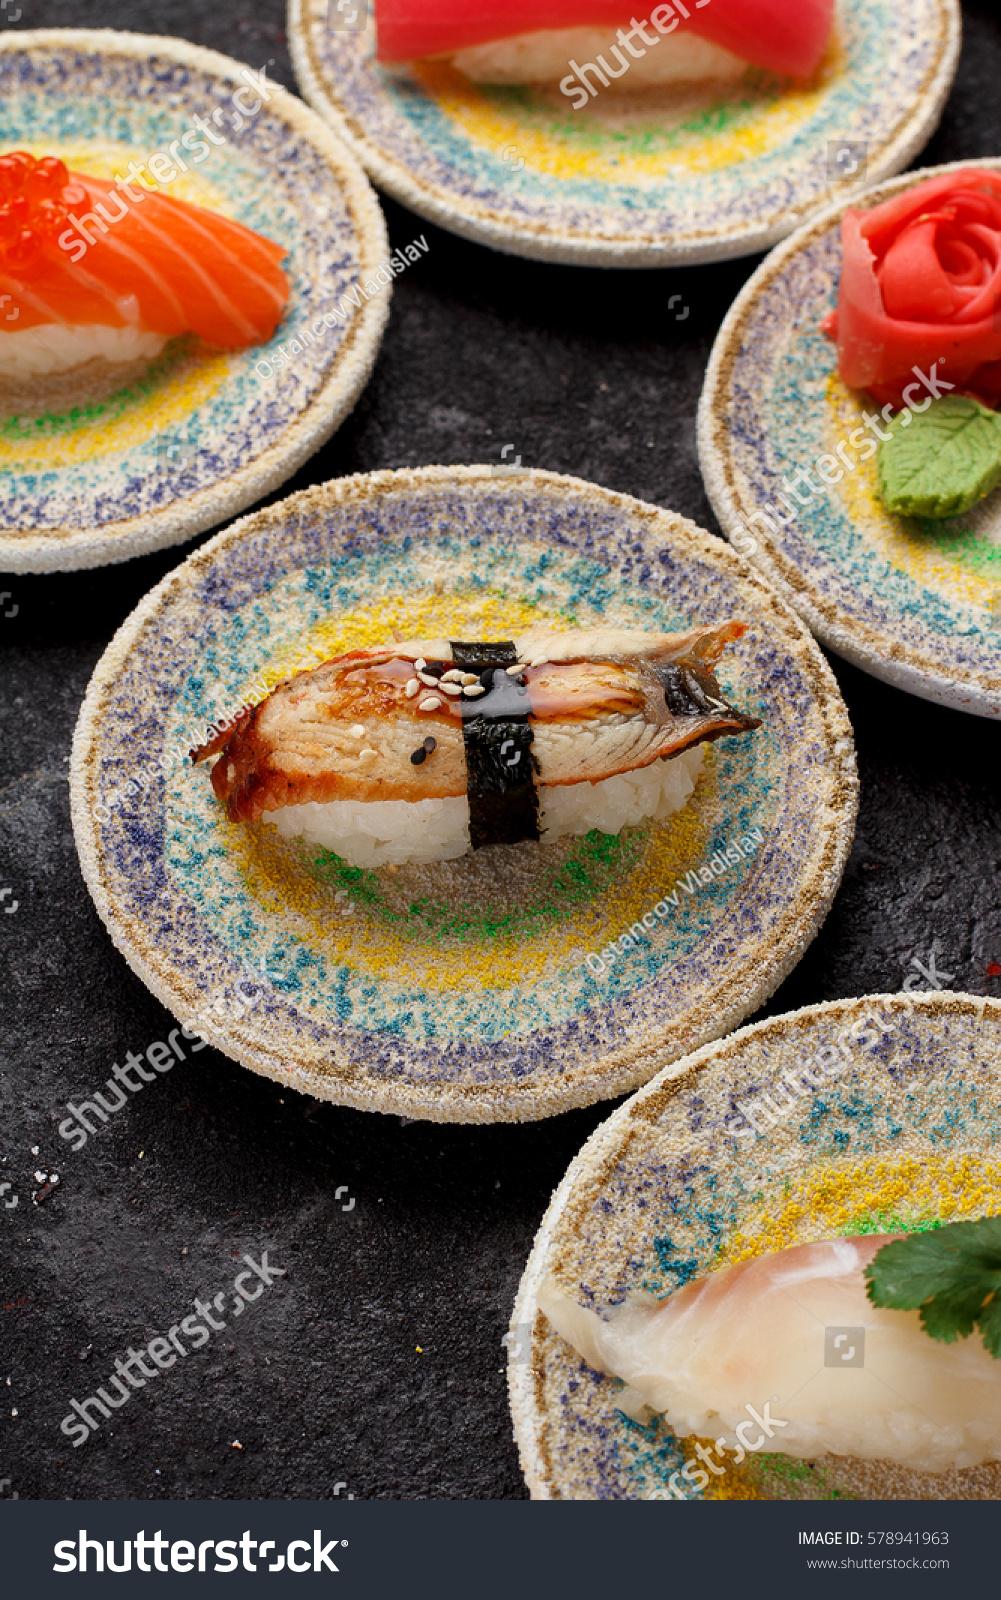 Japanese cuisine. Sushi on a decorative plates over dark concrete background. & Japanese Cuisine Sushi On Decorative Plates Stock Photo (Royalty ...